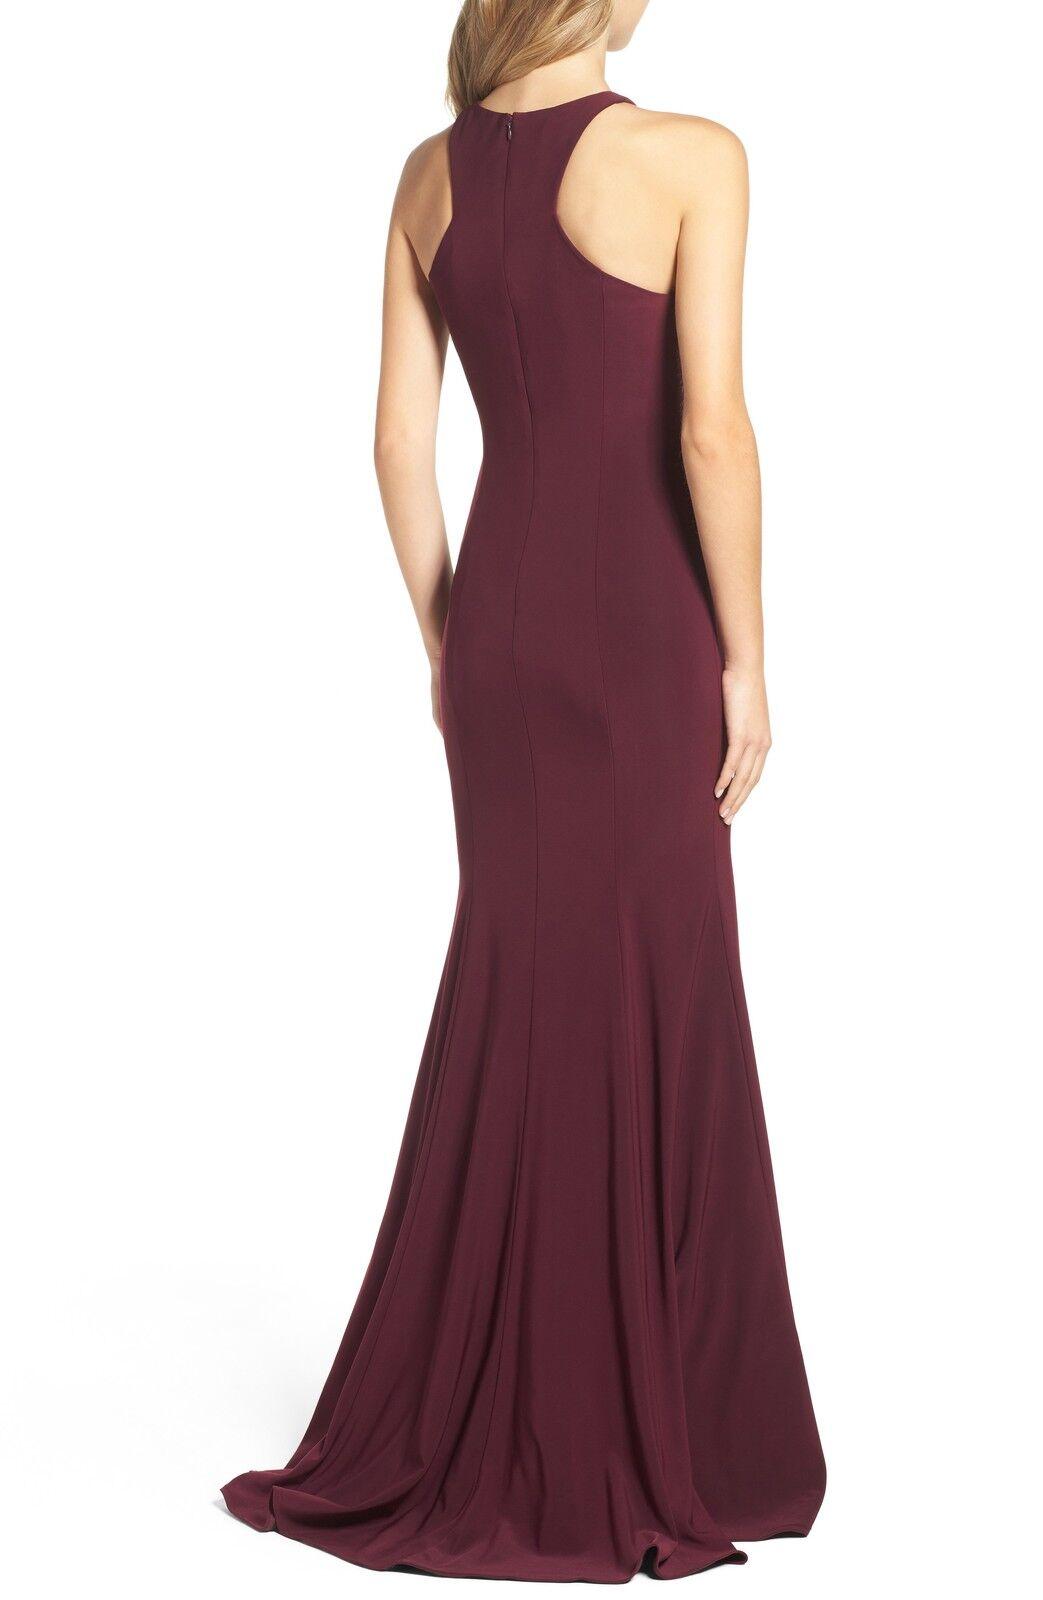 NEW XSCAPE Jersey Cutout Bodice Bodice Bodice GOWN DRESS SIZE 10  228 WINE NORDSTROM cb3109